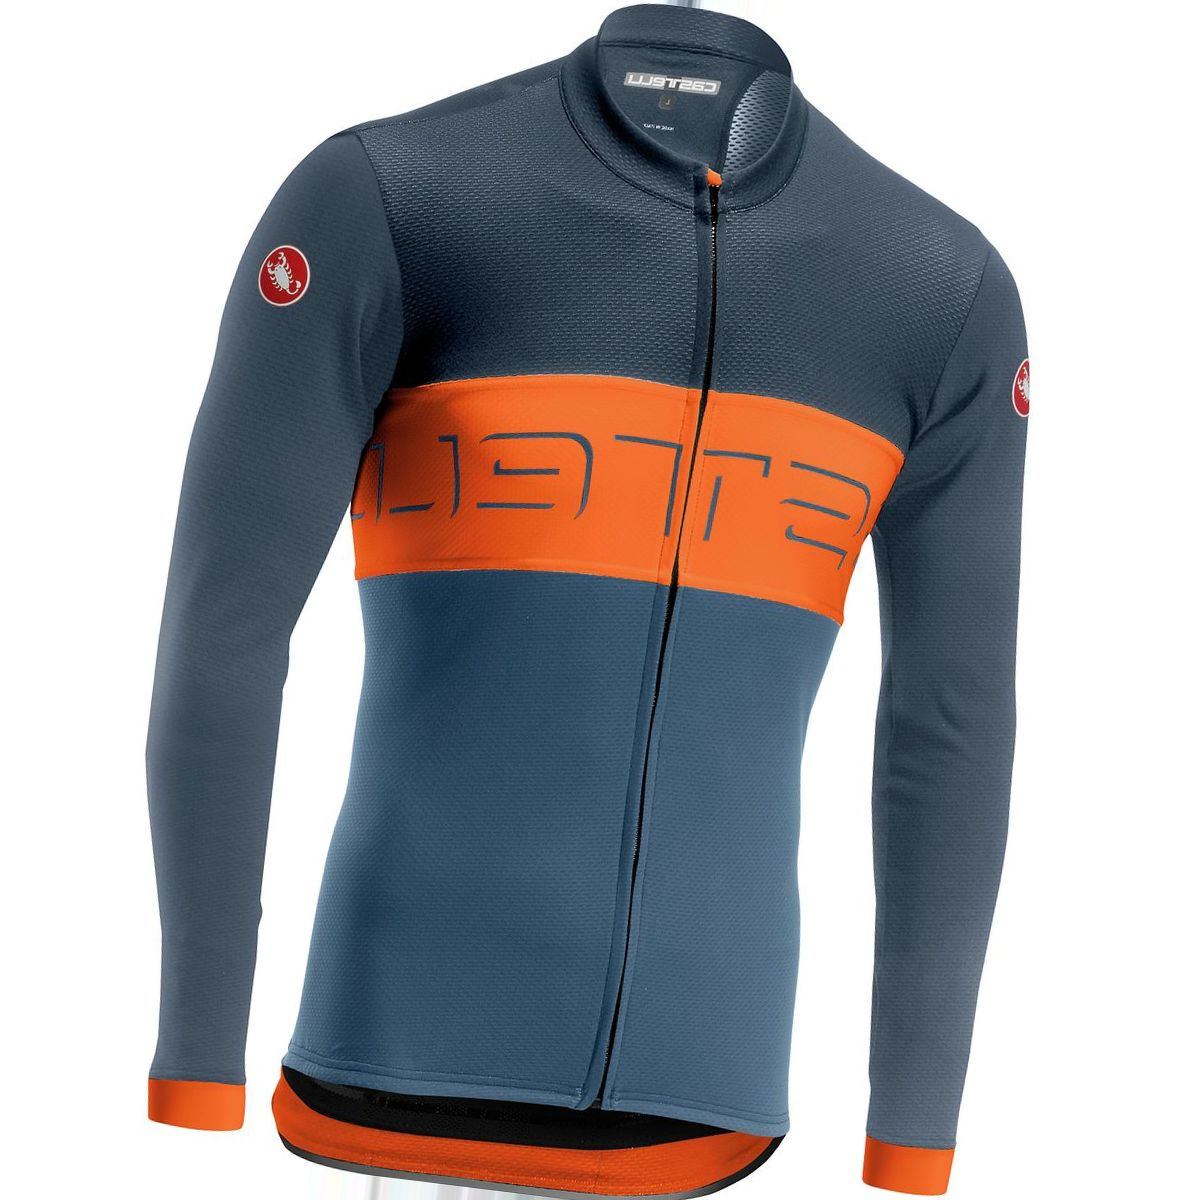 Castelli Prologo VI Long-Sleeve Full-Zip Jersey - Men's